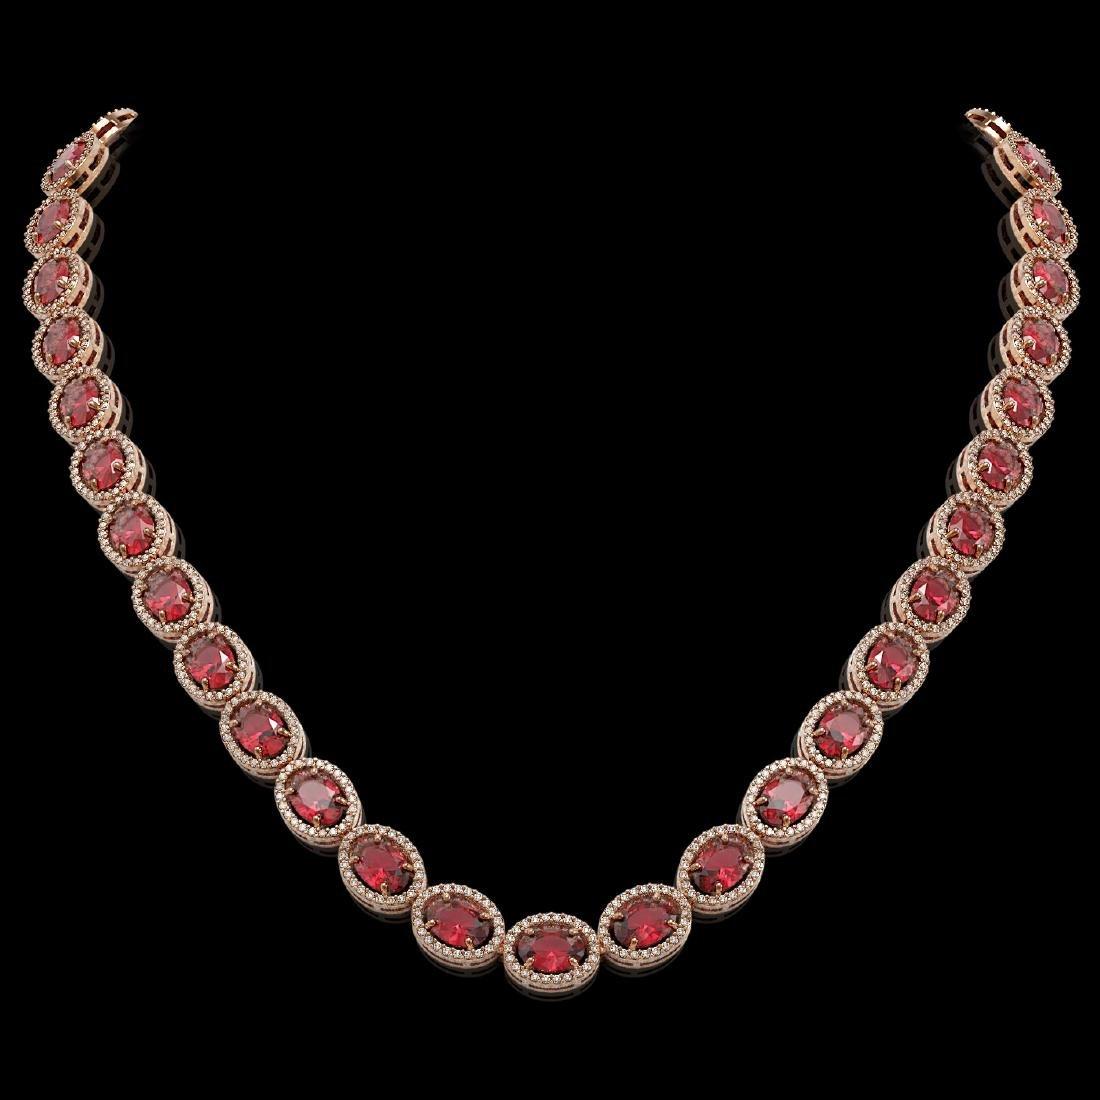 49.46 CTW Tourmaline & Diamond Halo Necklace 10K Rose